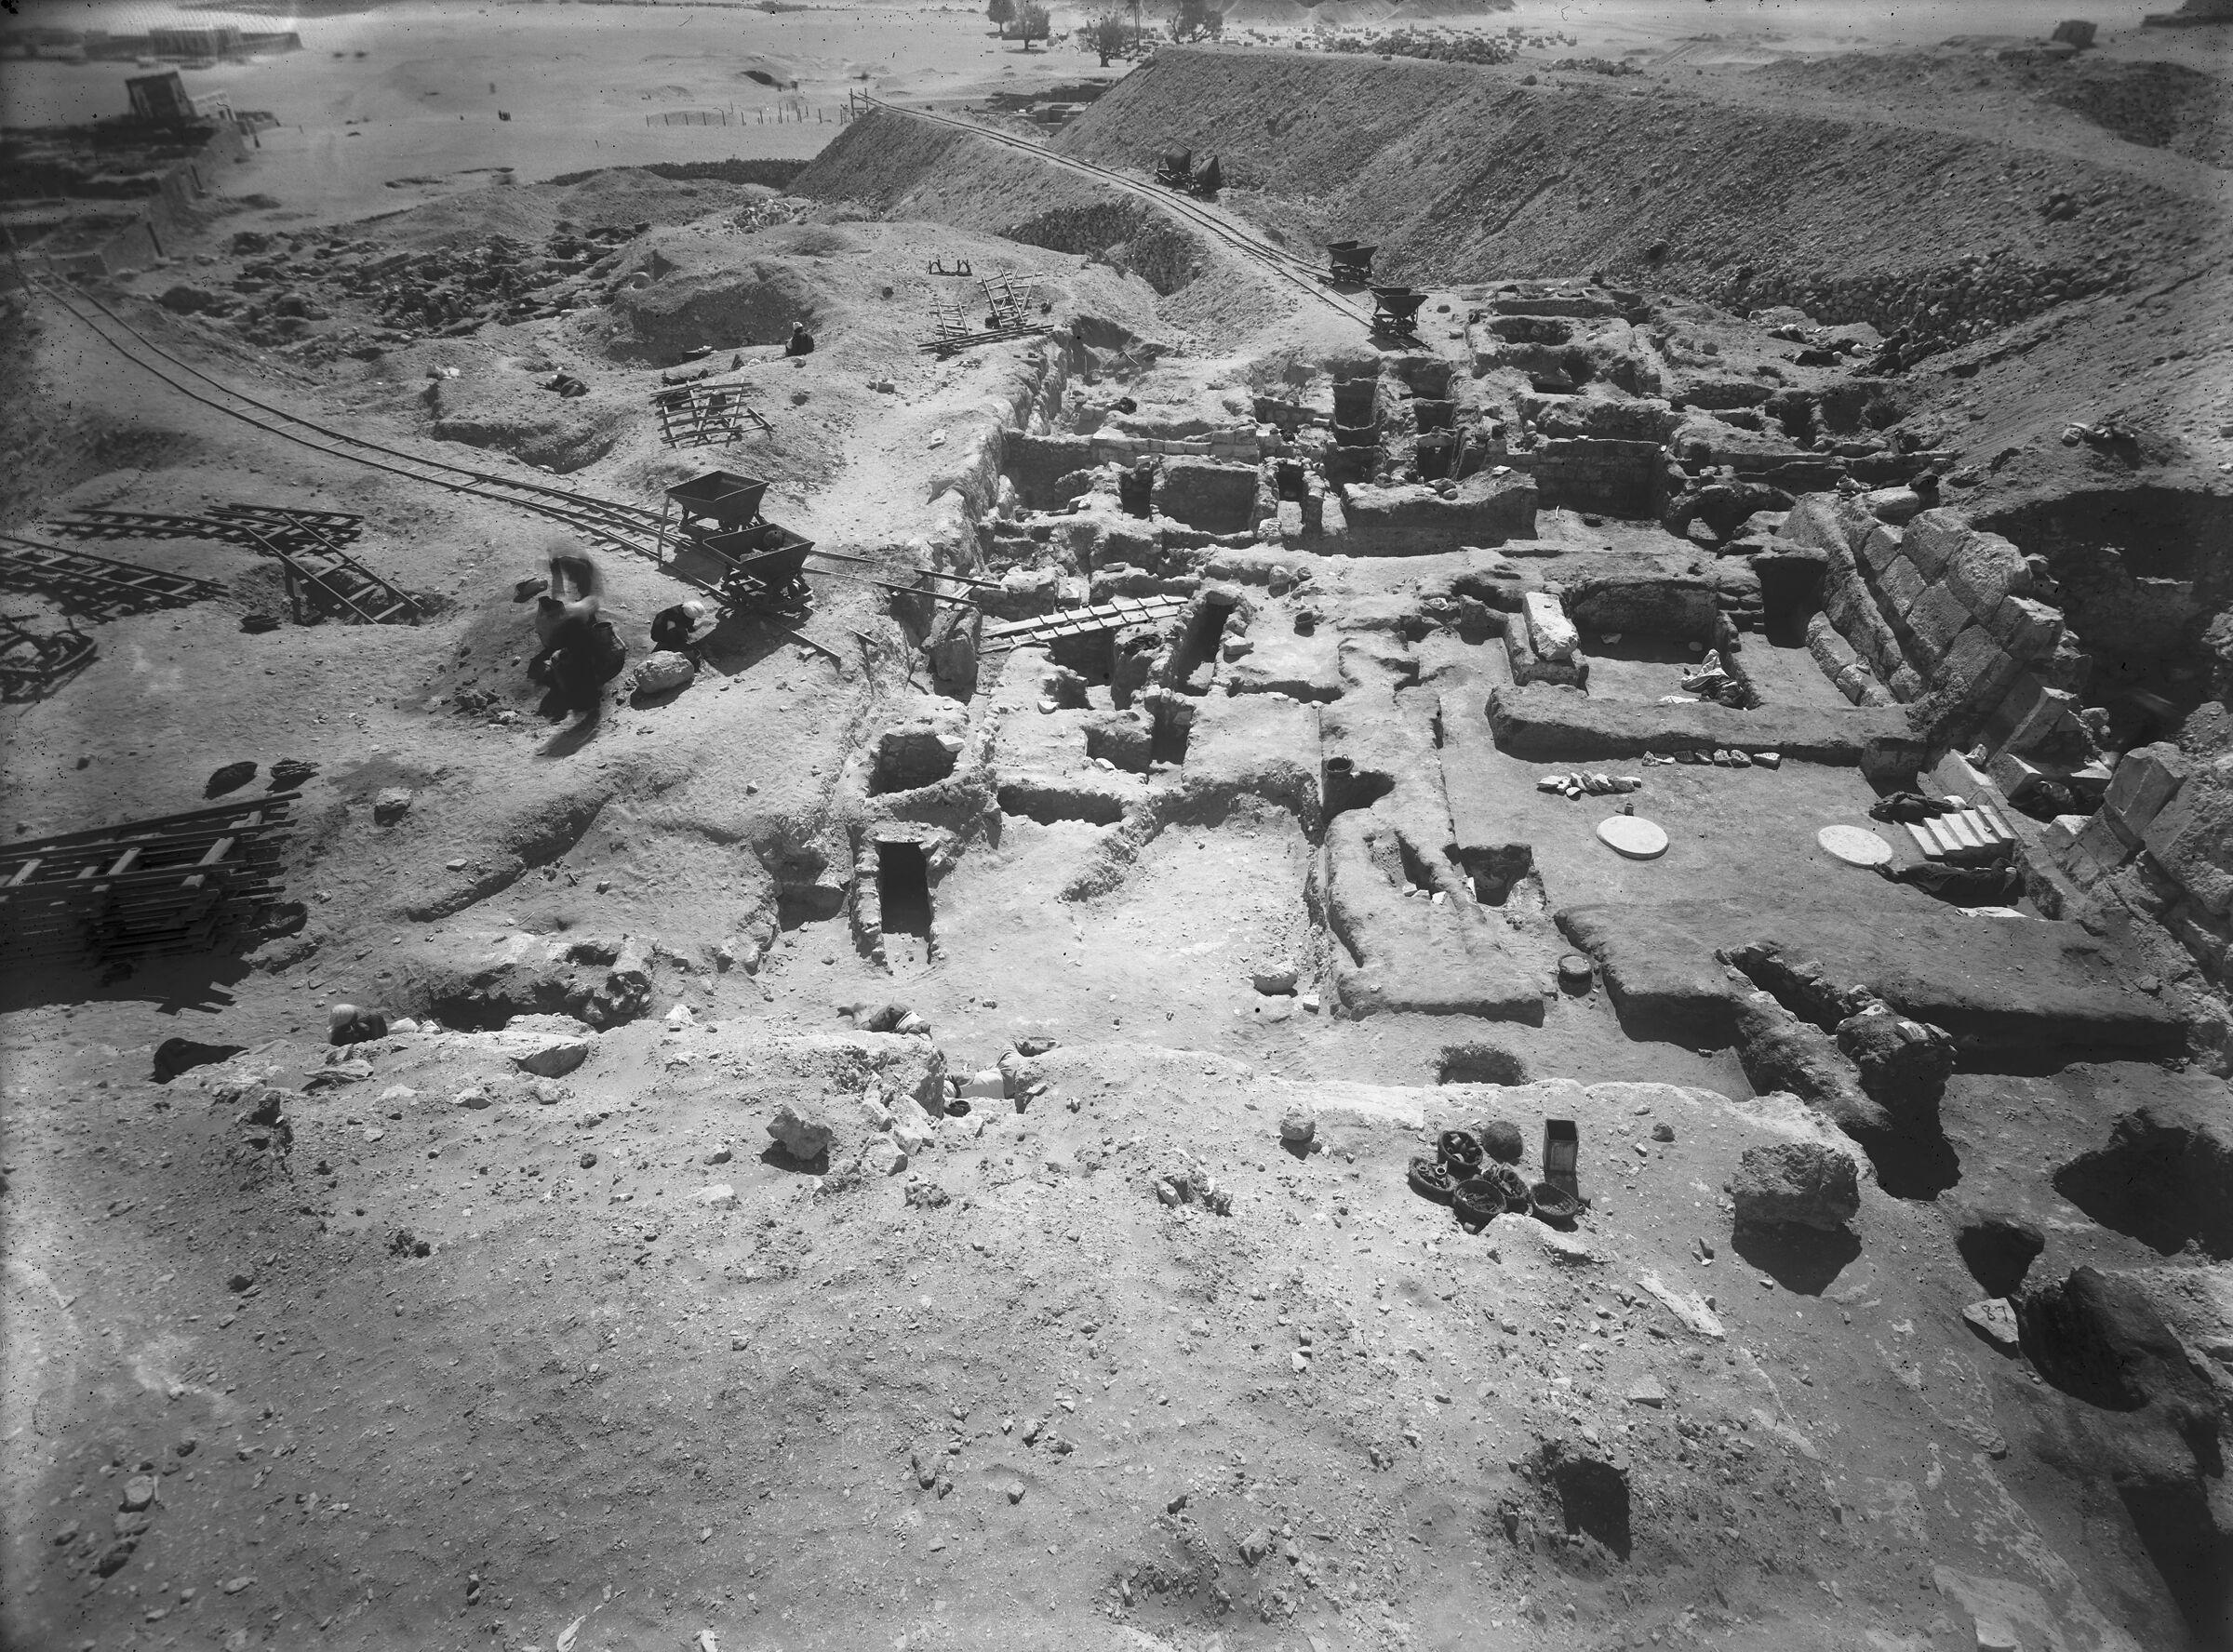 Eastern Cemetery: Site: Giza; View: G 7560, G 7690, G 7670, G 7562, G 7563, G 7566, G 7567, G 7568